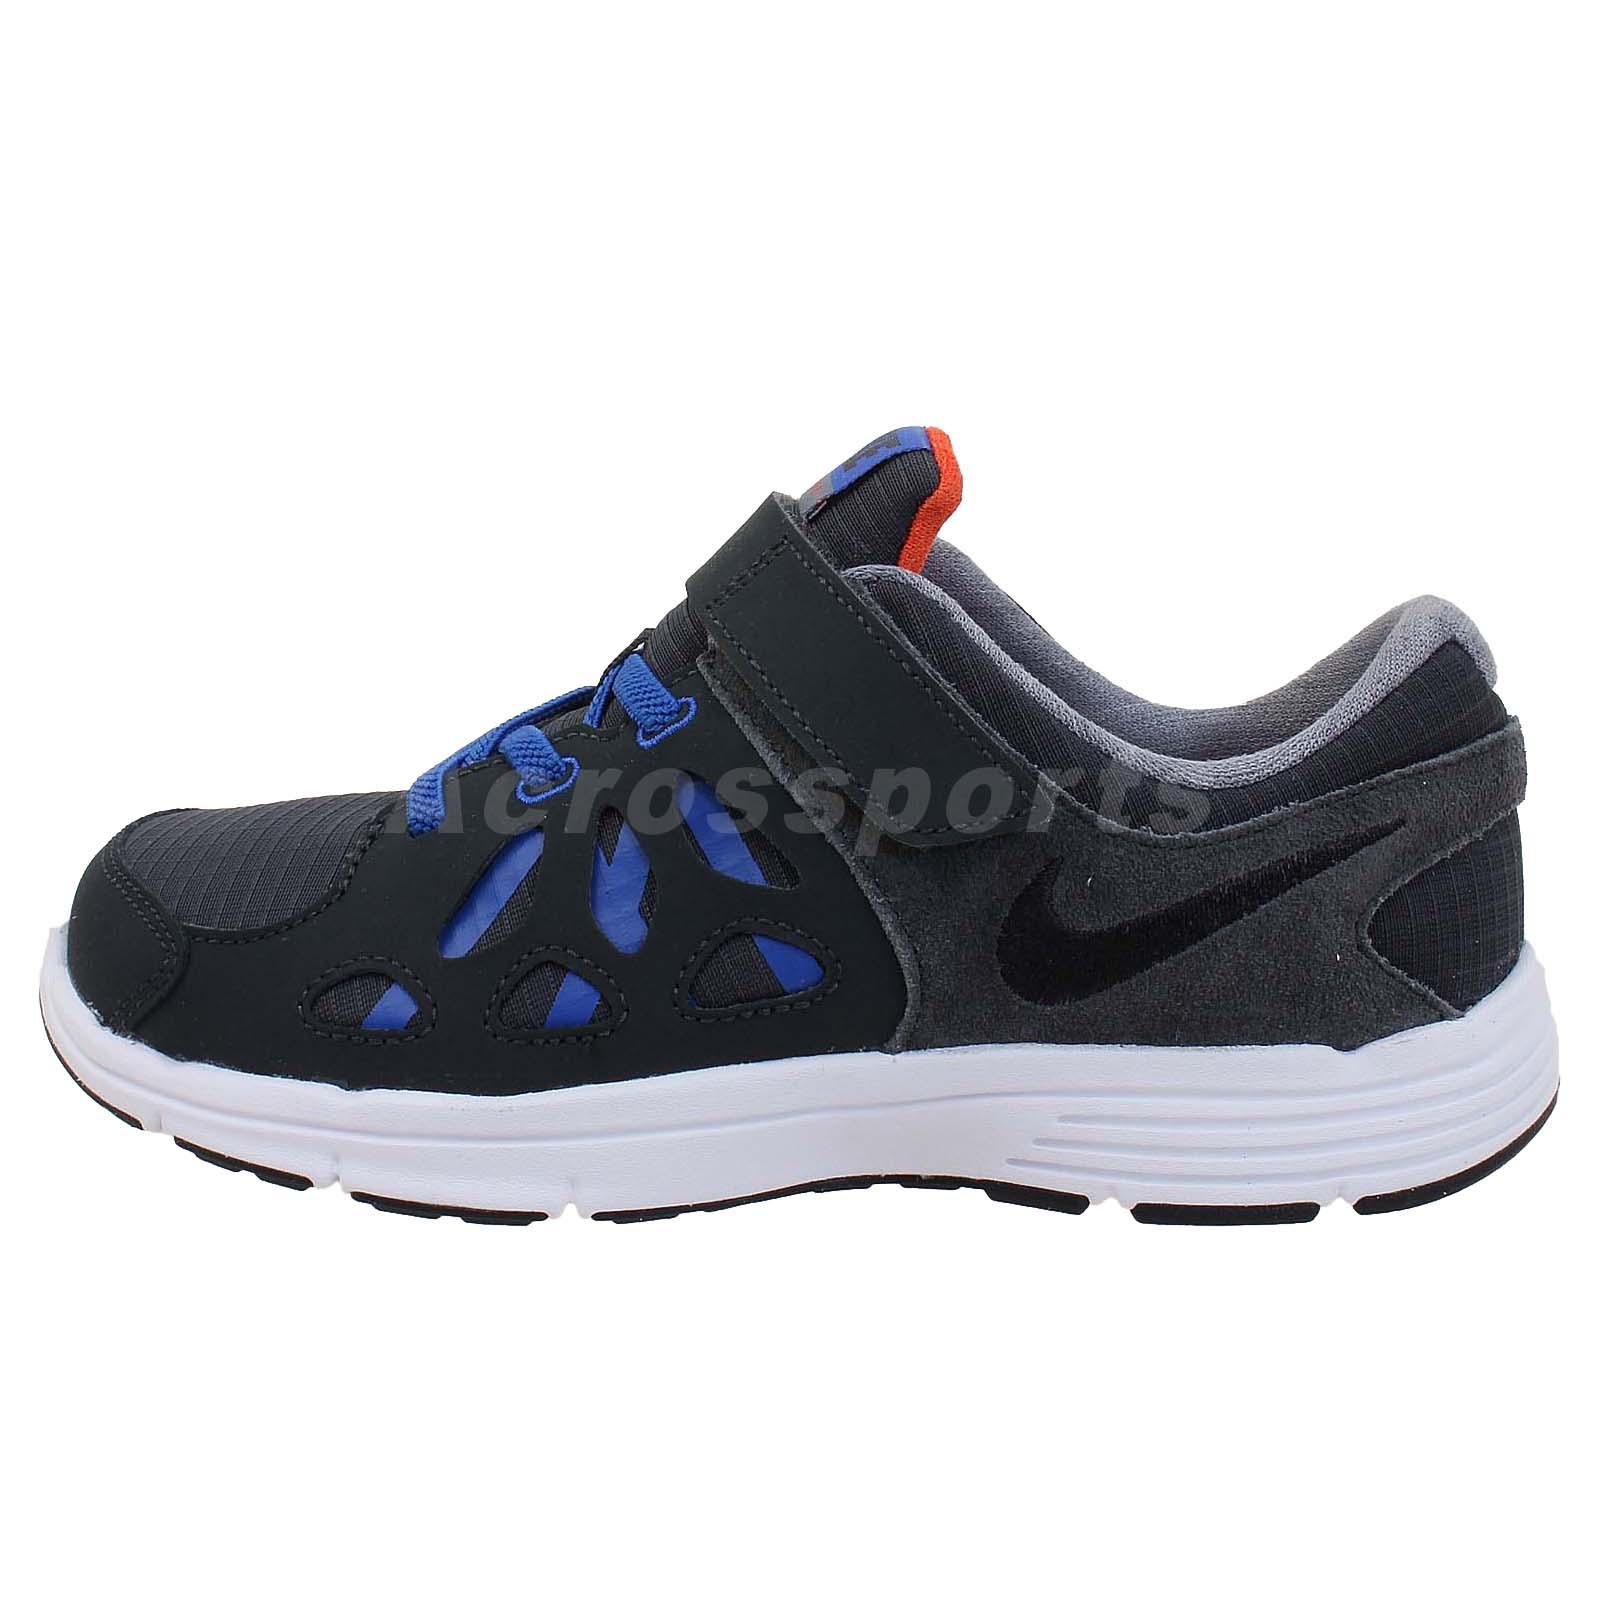 Nike Preschool Velcro Shoes